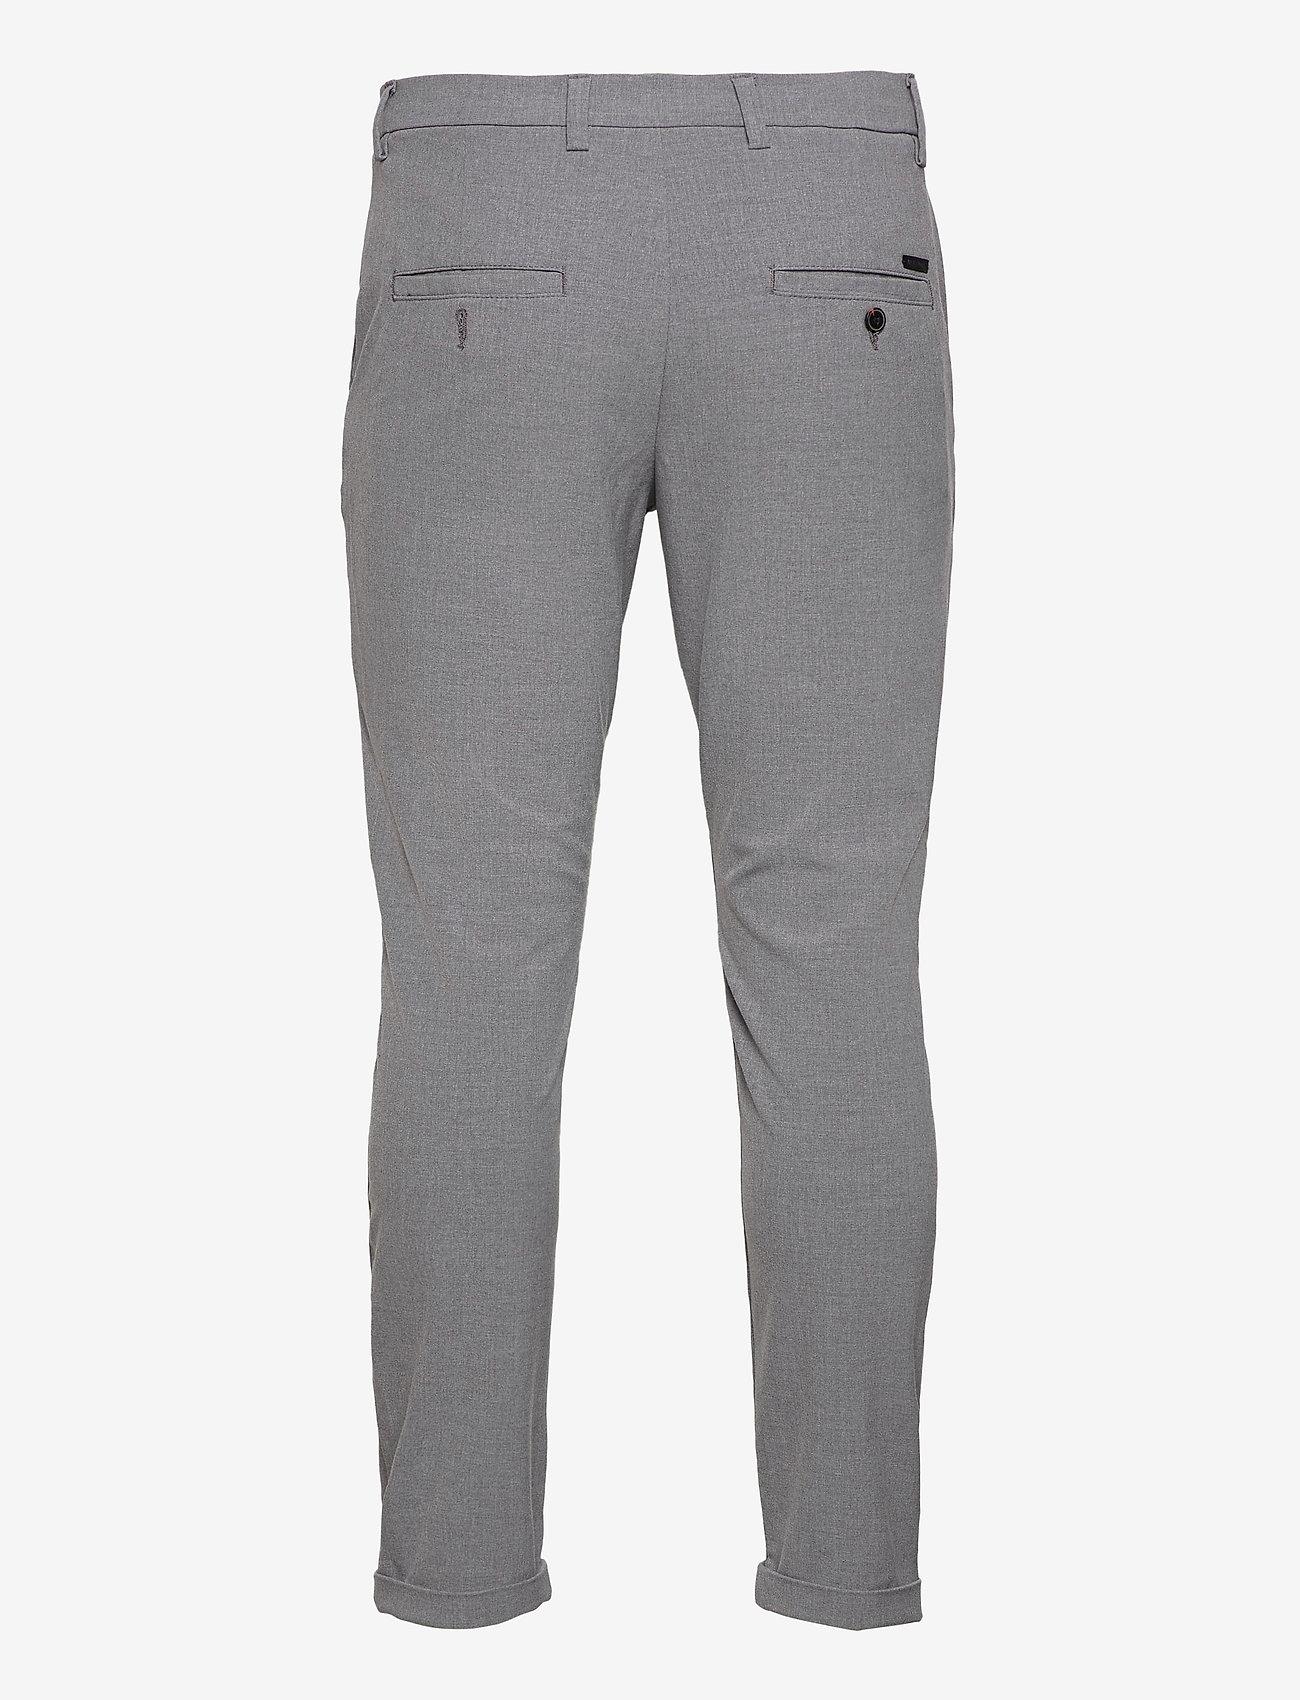 Jack & Jones - JJIMARCO JJCONNOR AKM 909 GREY MEL NOOS - pantalons habillés - grey melange - 1